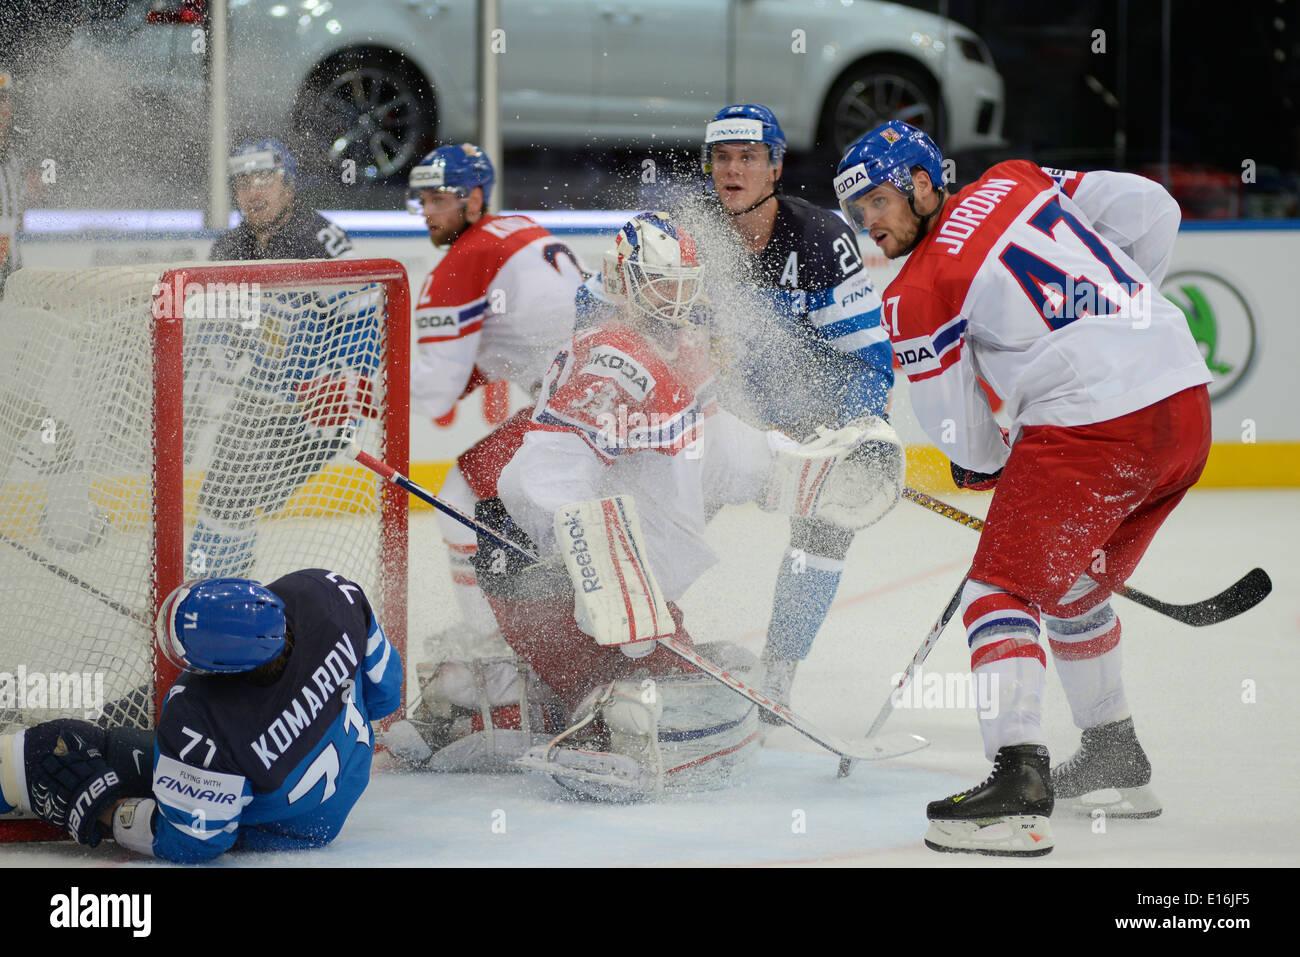 SALAK Alexander and JORDAN Michal of Czech during 2014 IIHF World Ice Hockey Championship semifinal match at Minsk Arena - Stock Image